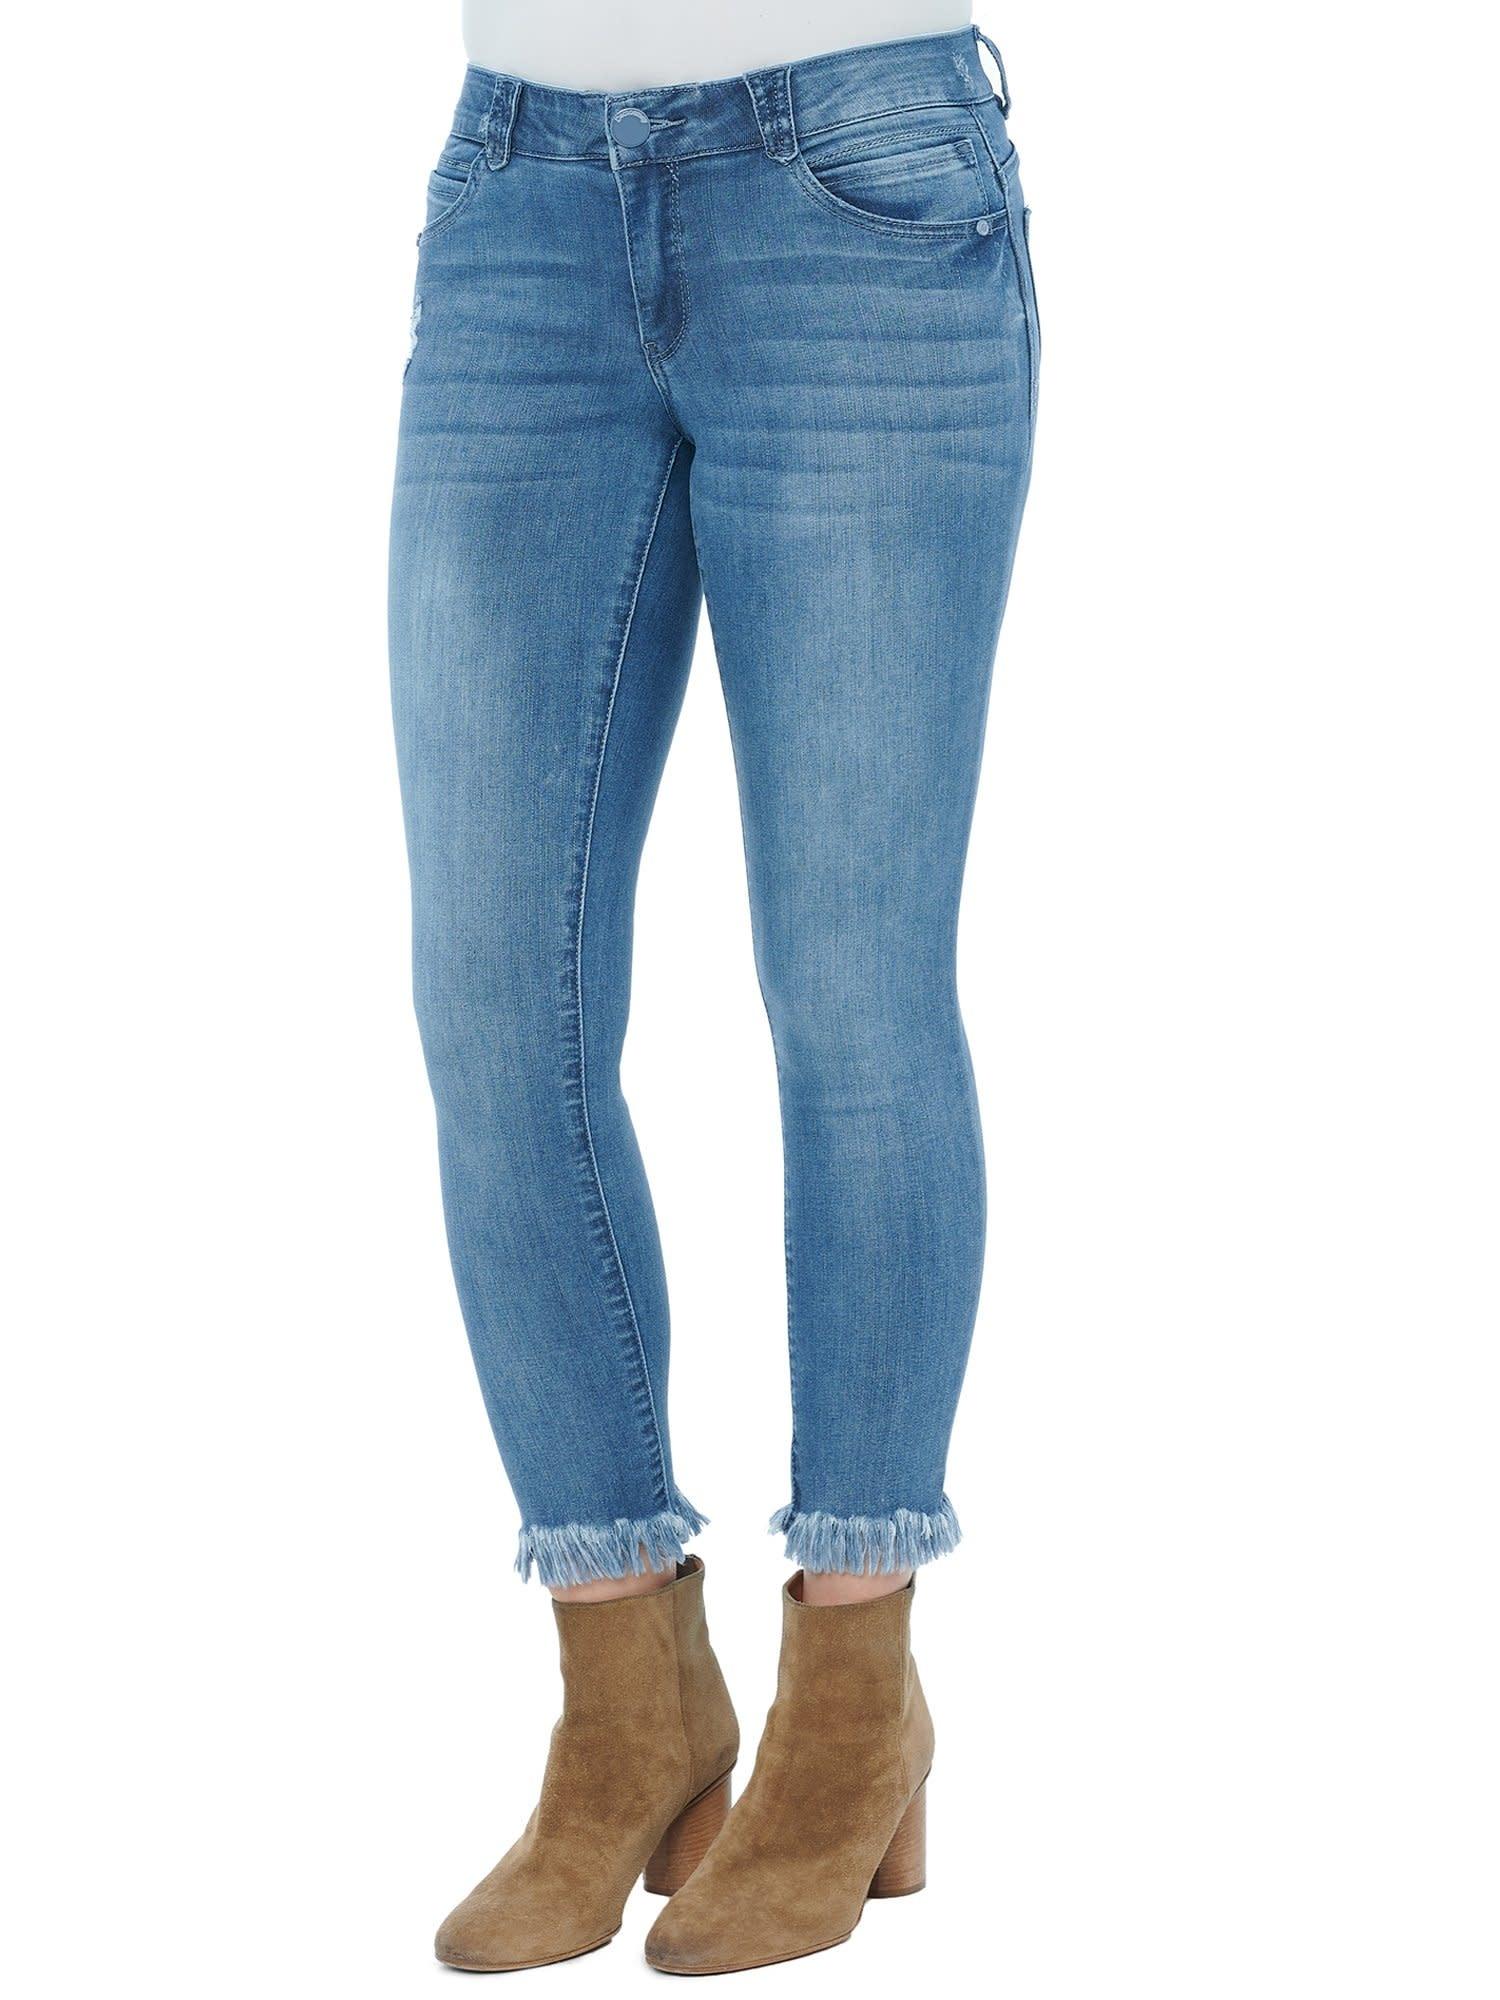 Democracy Light Blue Denim Ankle Skimmer Jeans w Chewed Hem